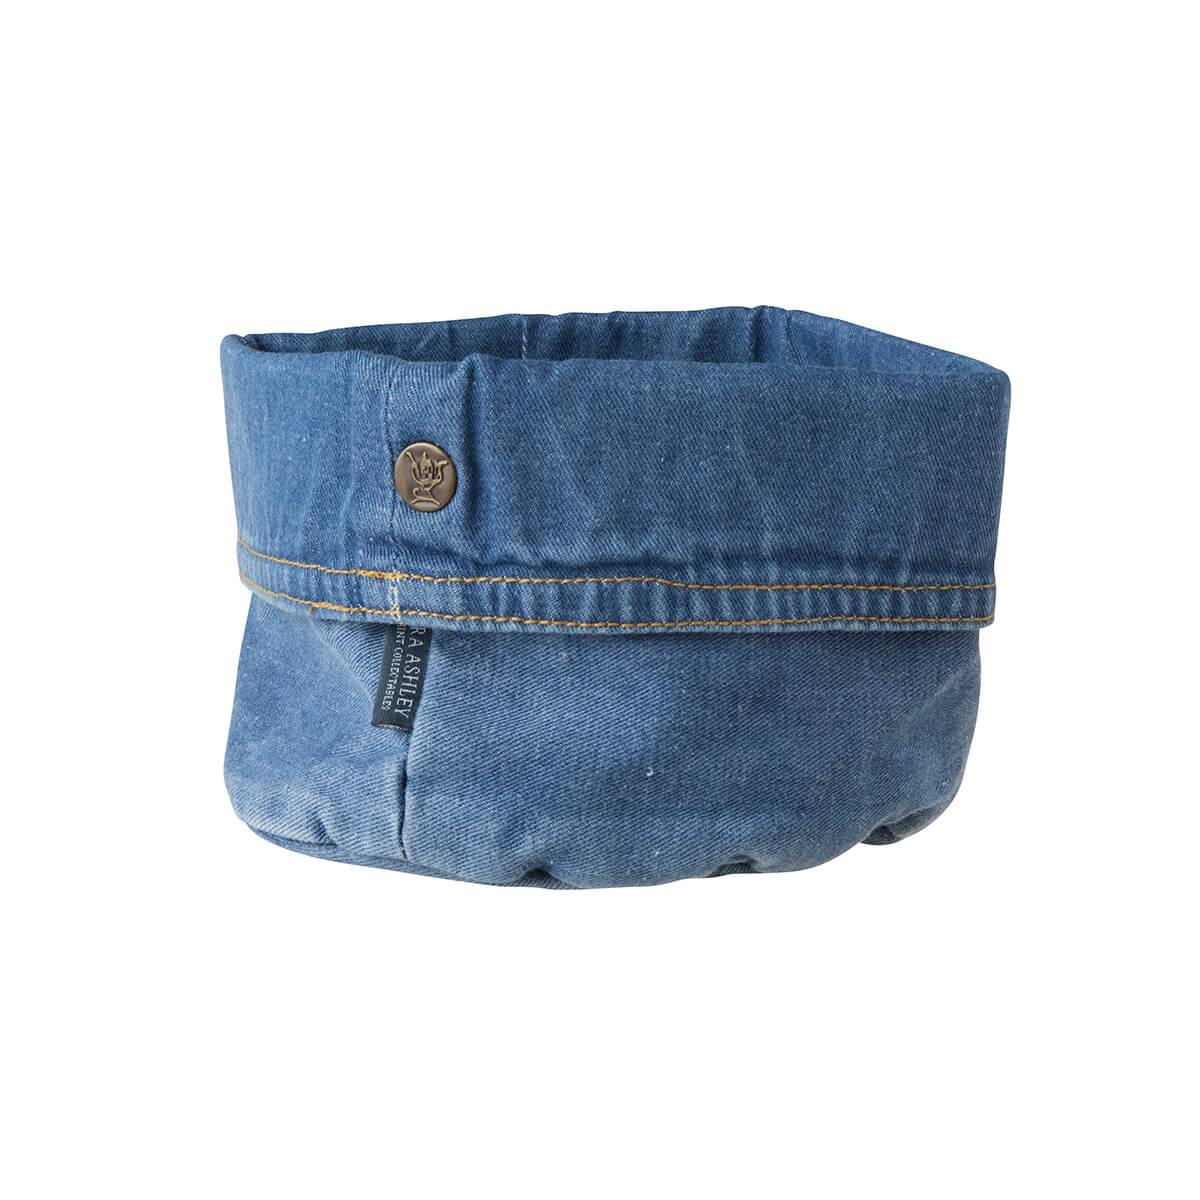 Онлайн каталог PROMENU: Тканевый мешок-хлебница Laura Ashley BLUEPRINT, 11х17 см, синий Laura Ashley 178447